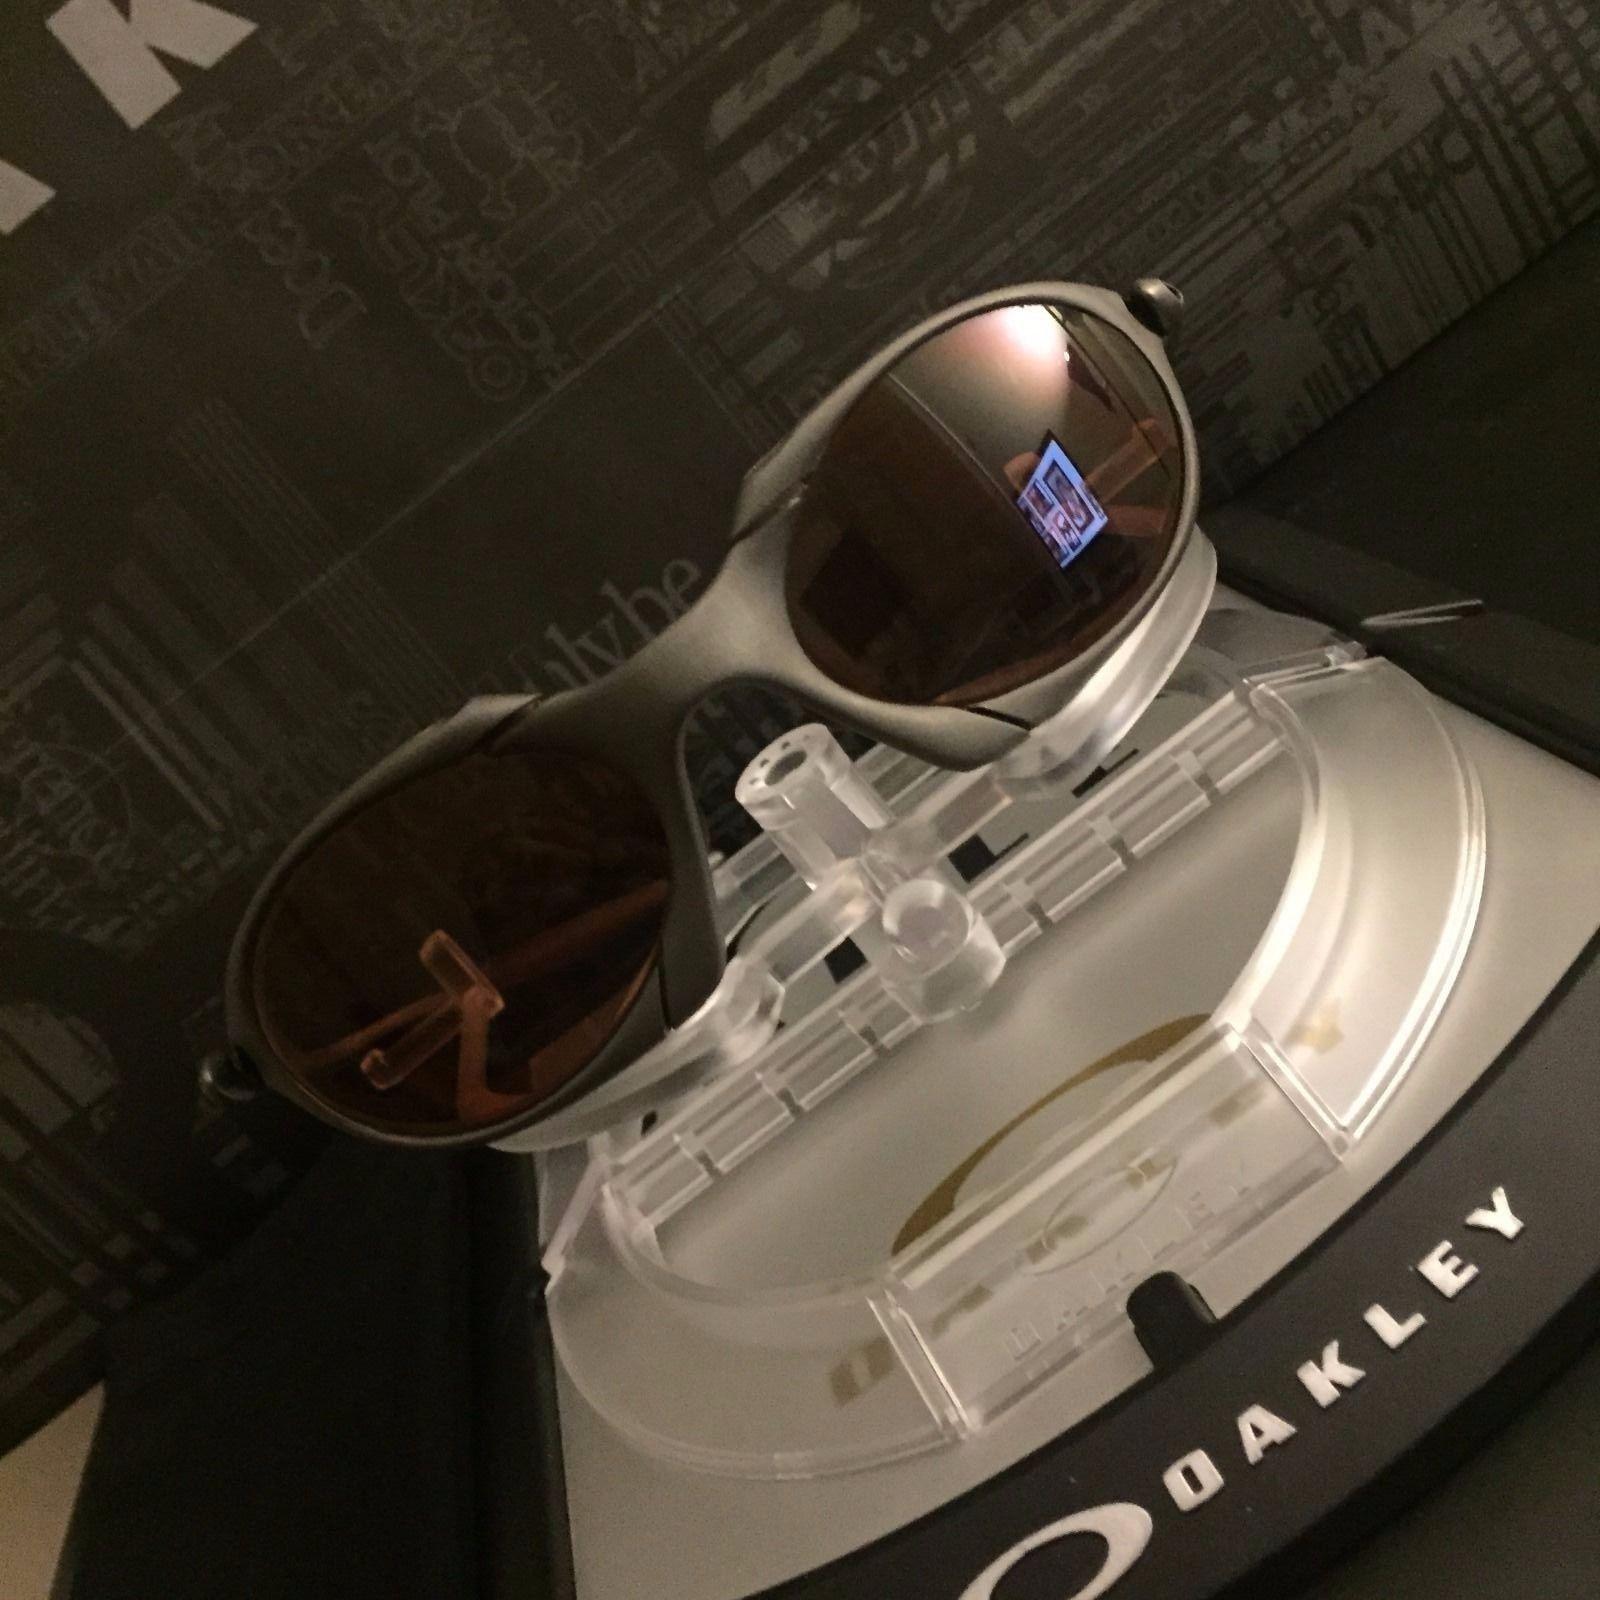 Oakley Romeo 1 x metal - c.jpg